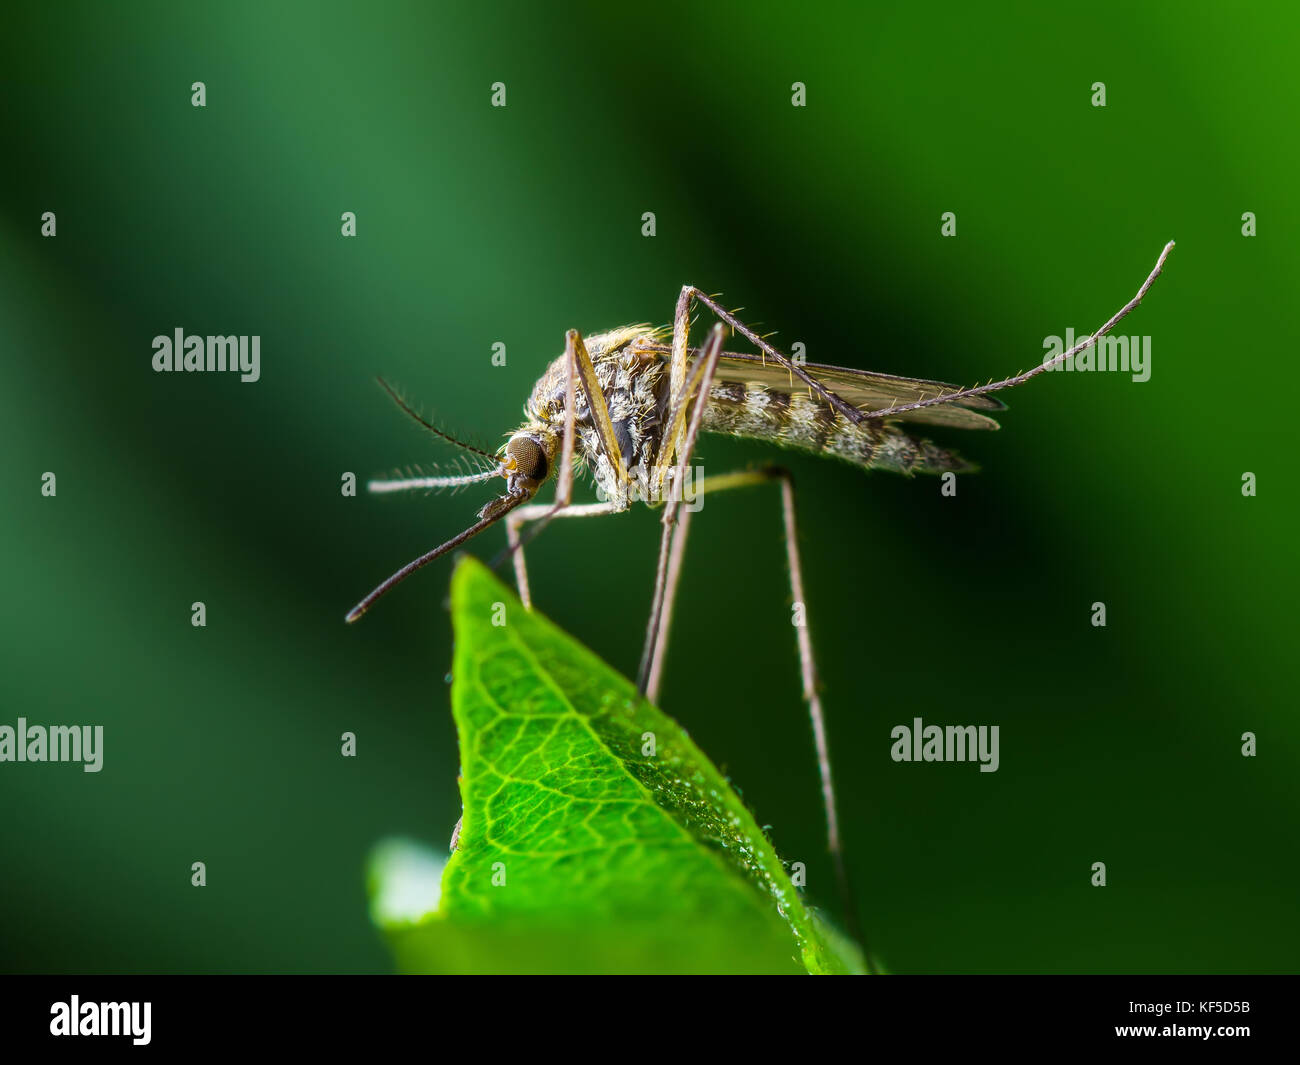 Gelbfieber, Malaria oder zika Virus Infektion - moskito Insekt auf Blatt Stockbild